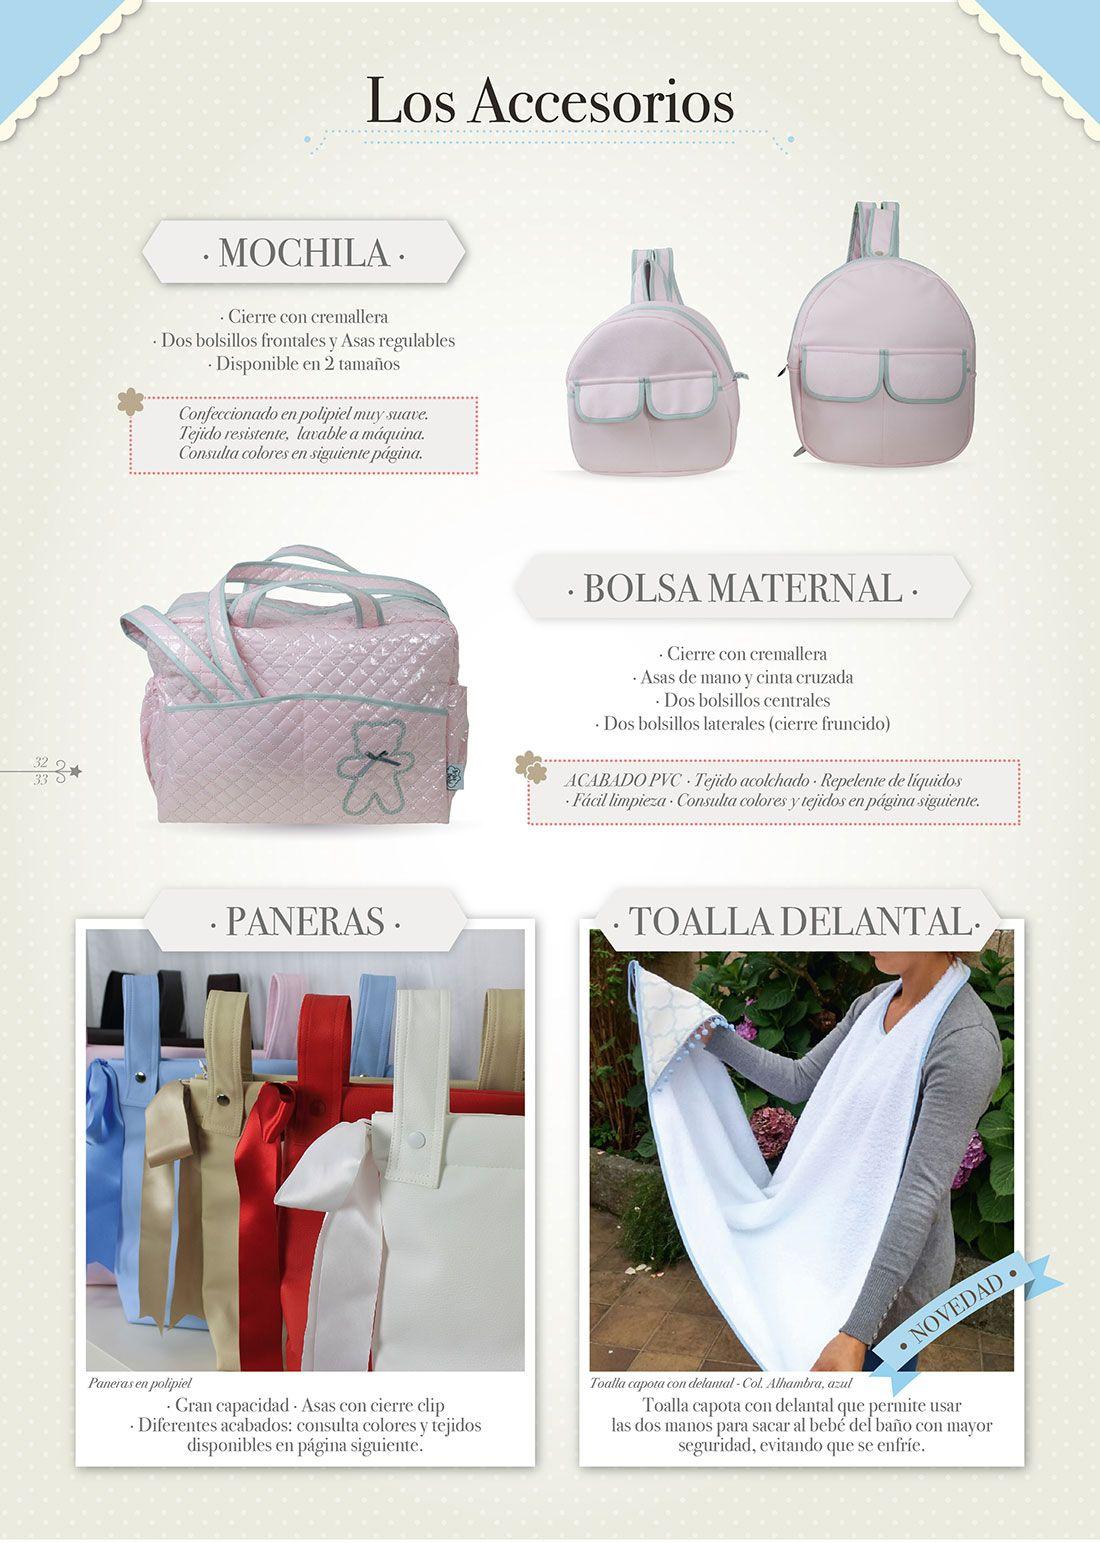 Mochilas-paneras-bolsa-maternal-toalla-delantal-Brisabebe